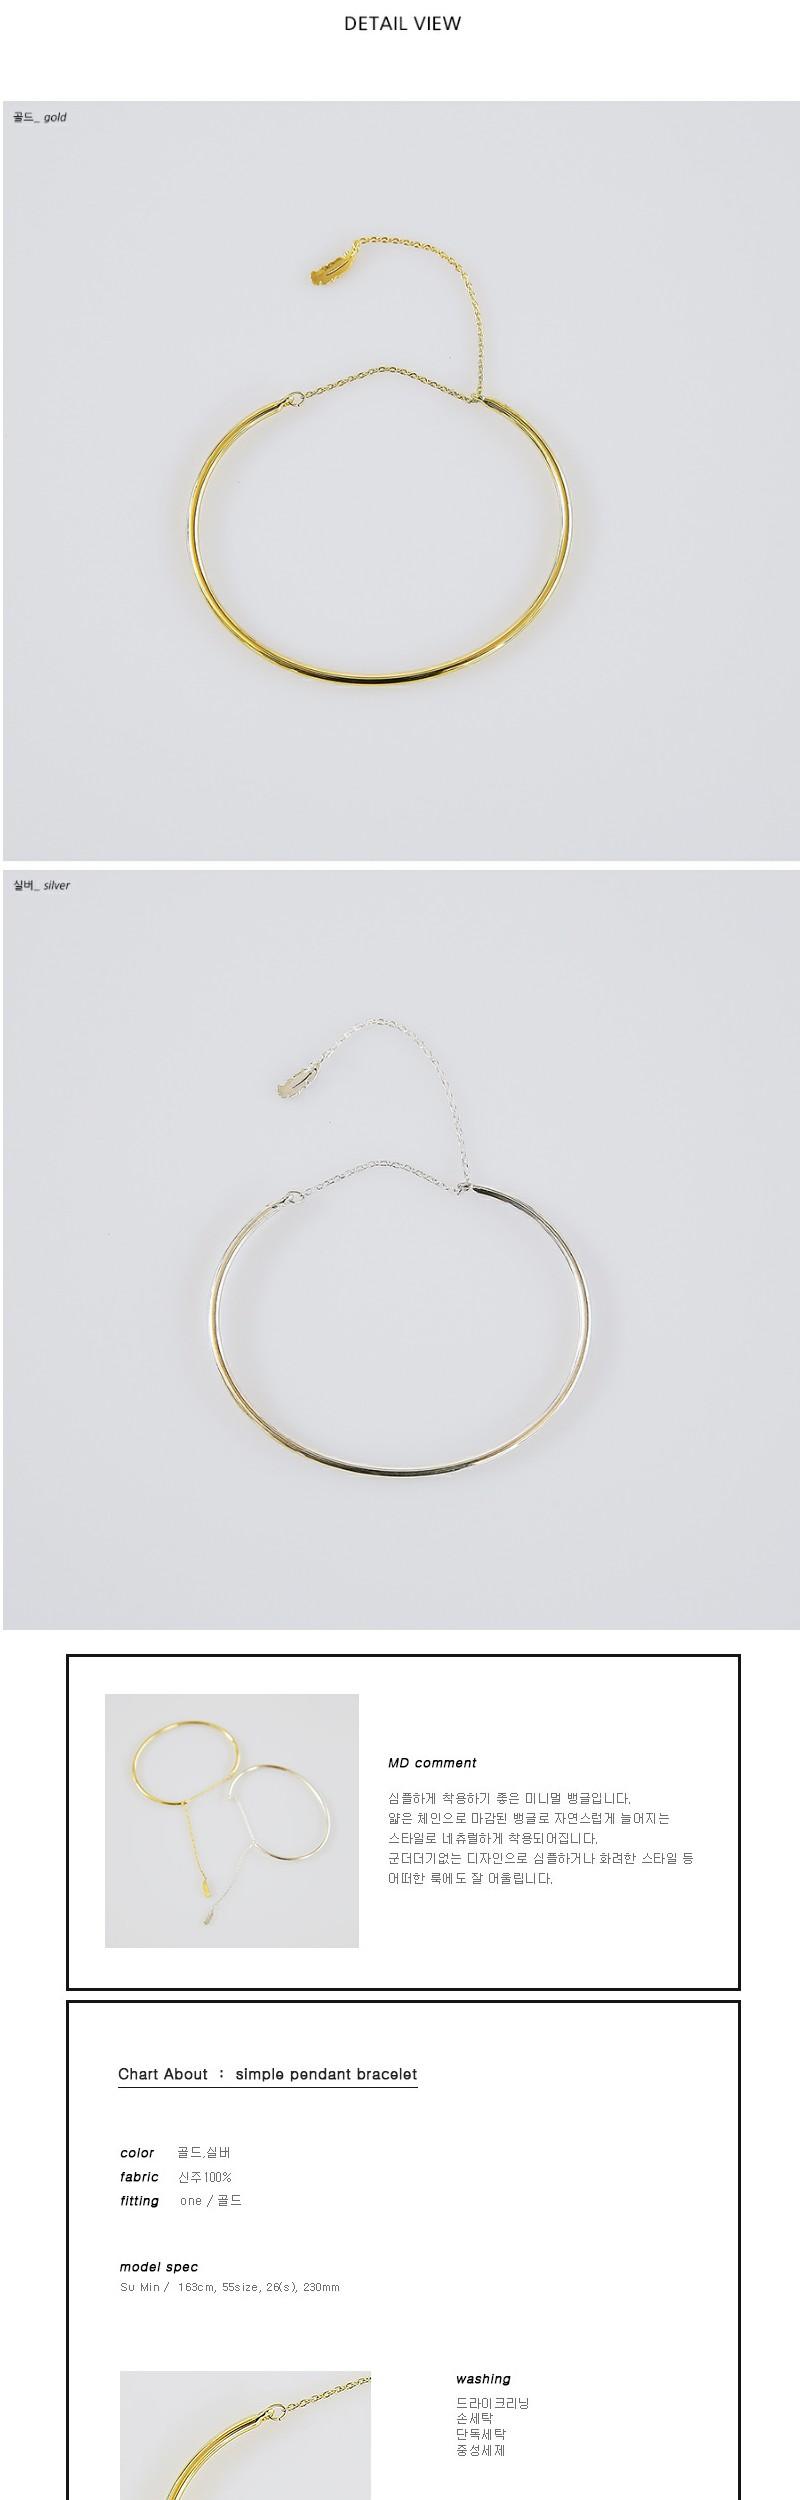 simple pendant bracelet